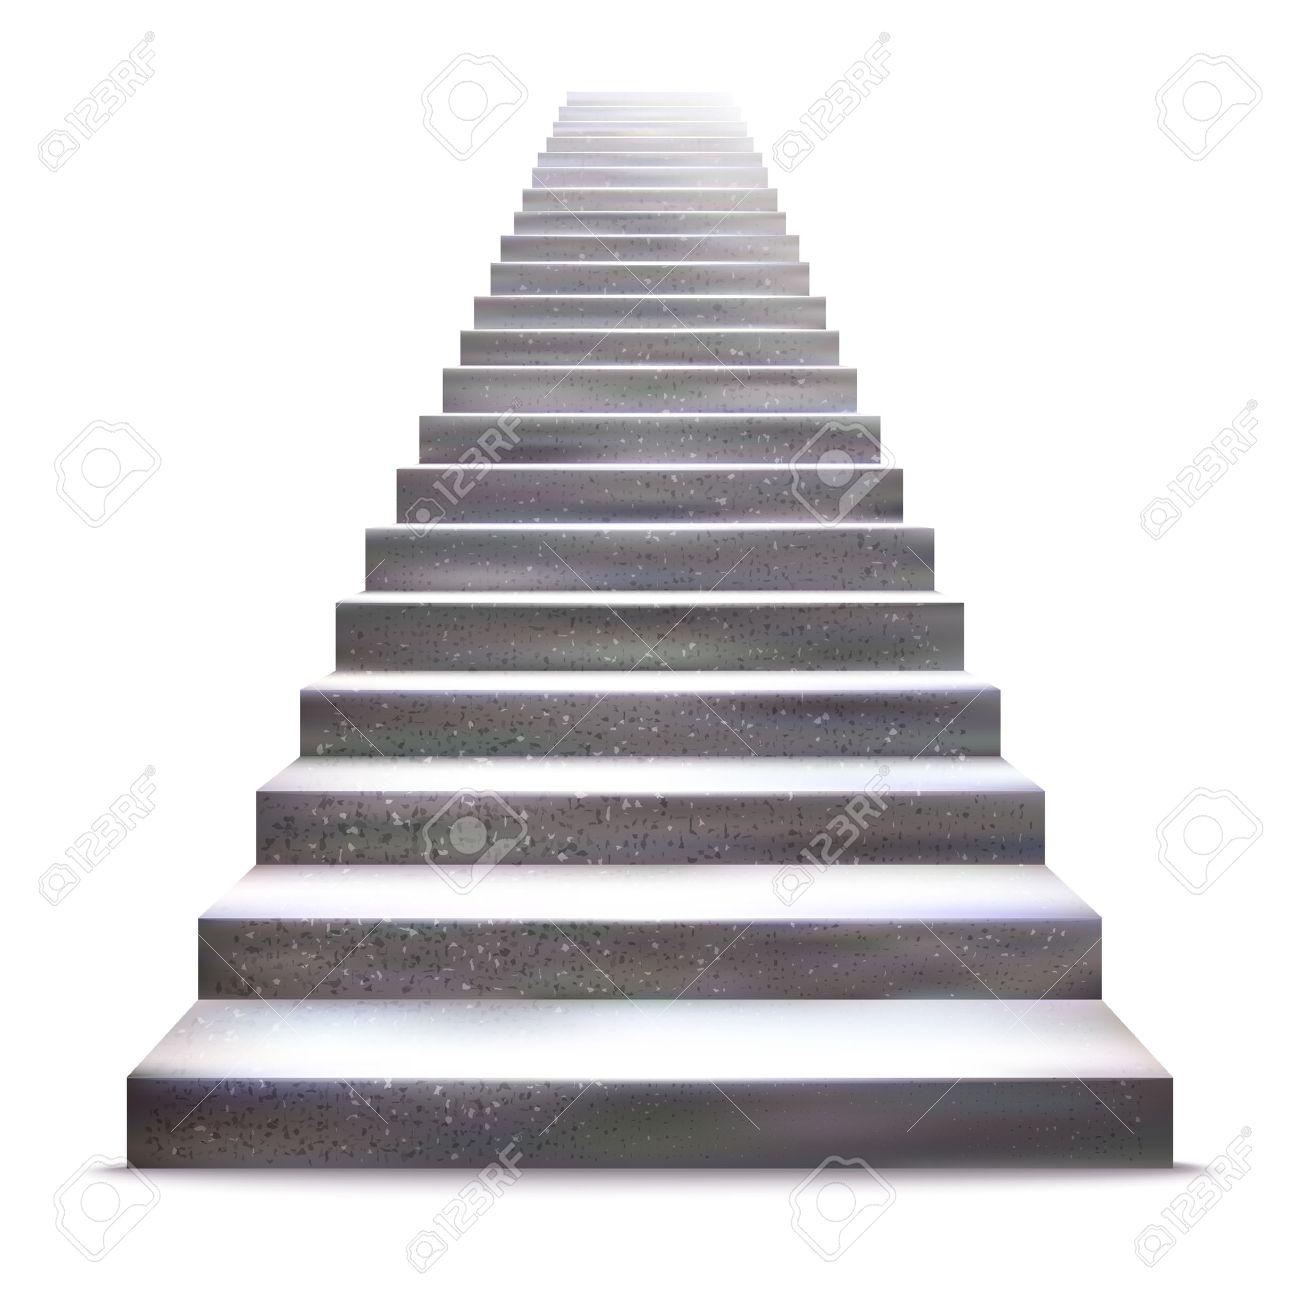 Realistic stone ladder illustration. - 41930451